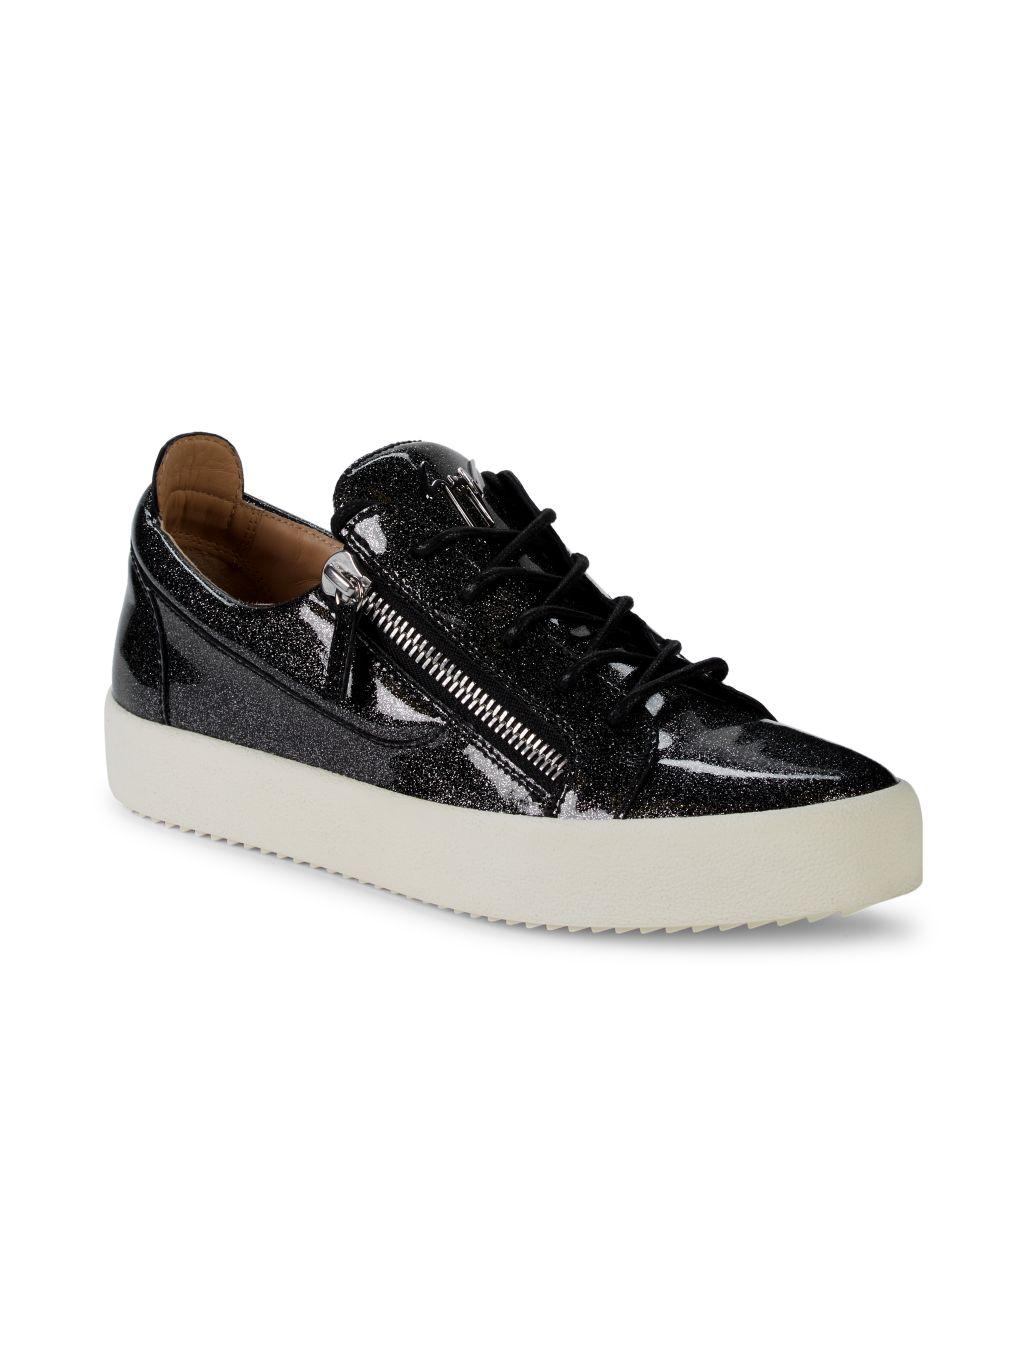 Giuseppe Zanotti Low-Top Patent Leather Glitter Sneakers